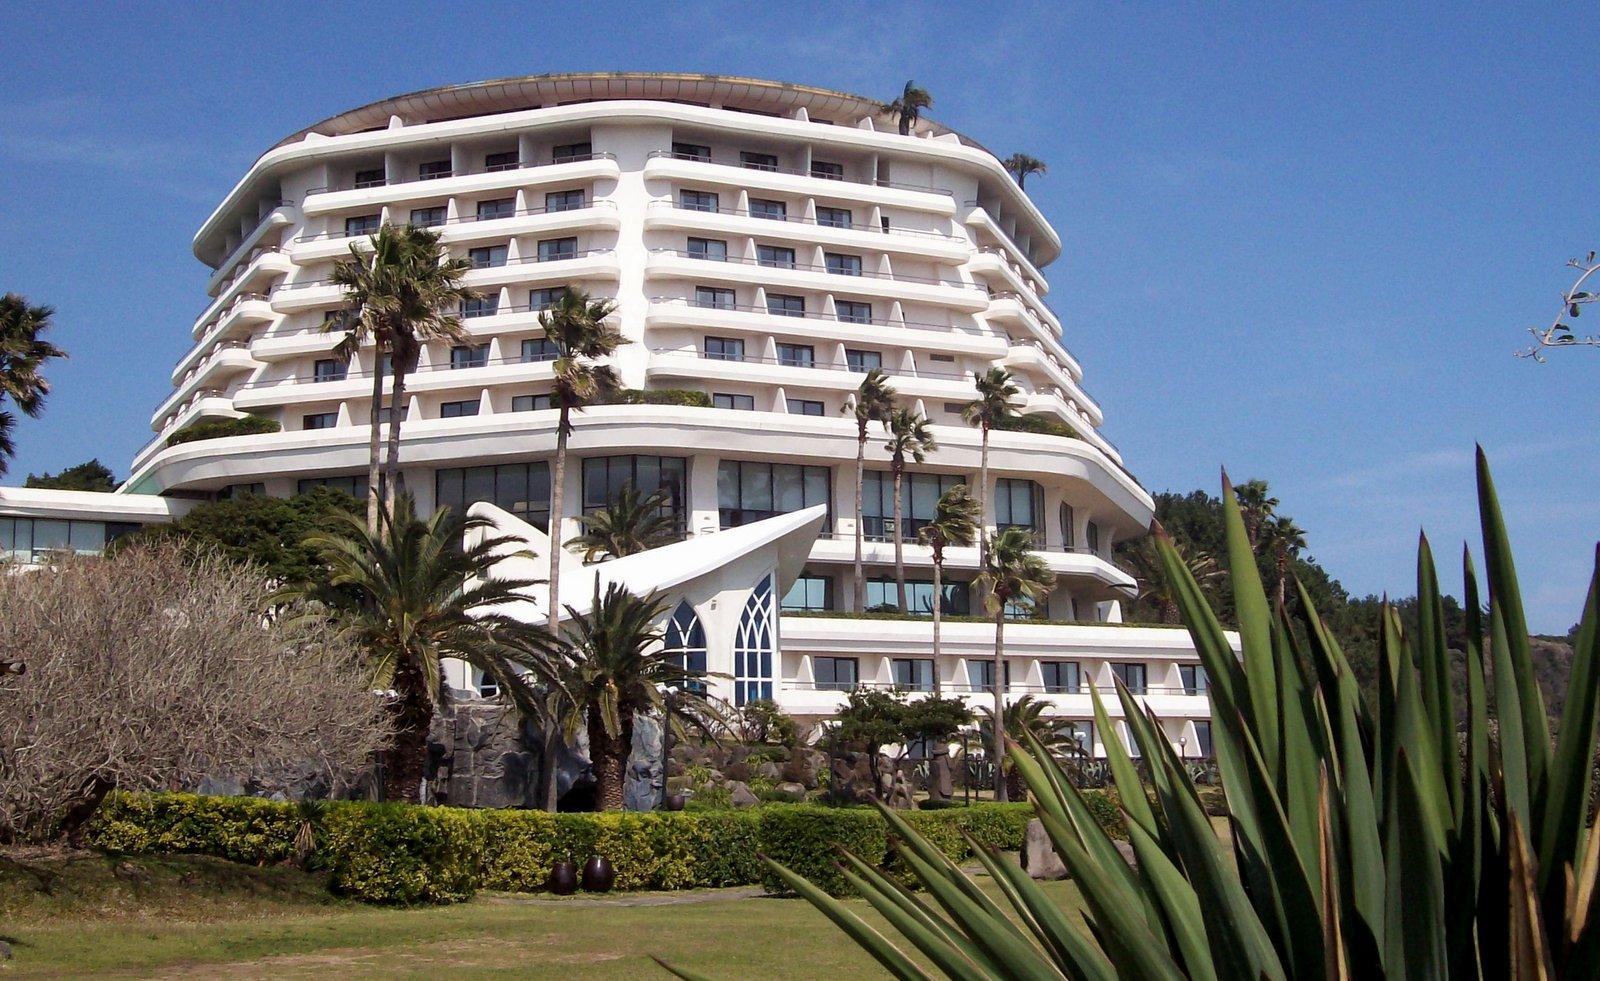 Hyatt Regency Hotel - Jungmun